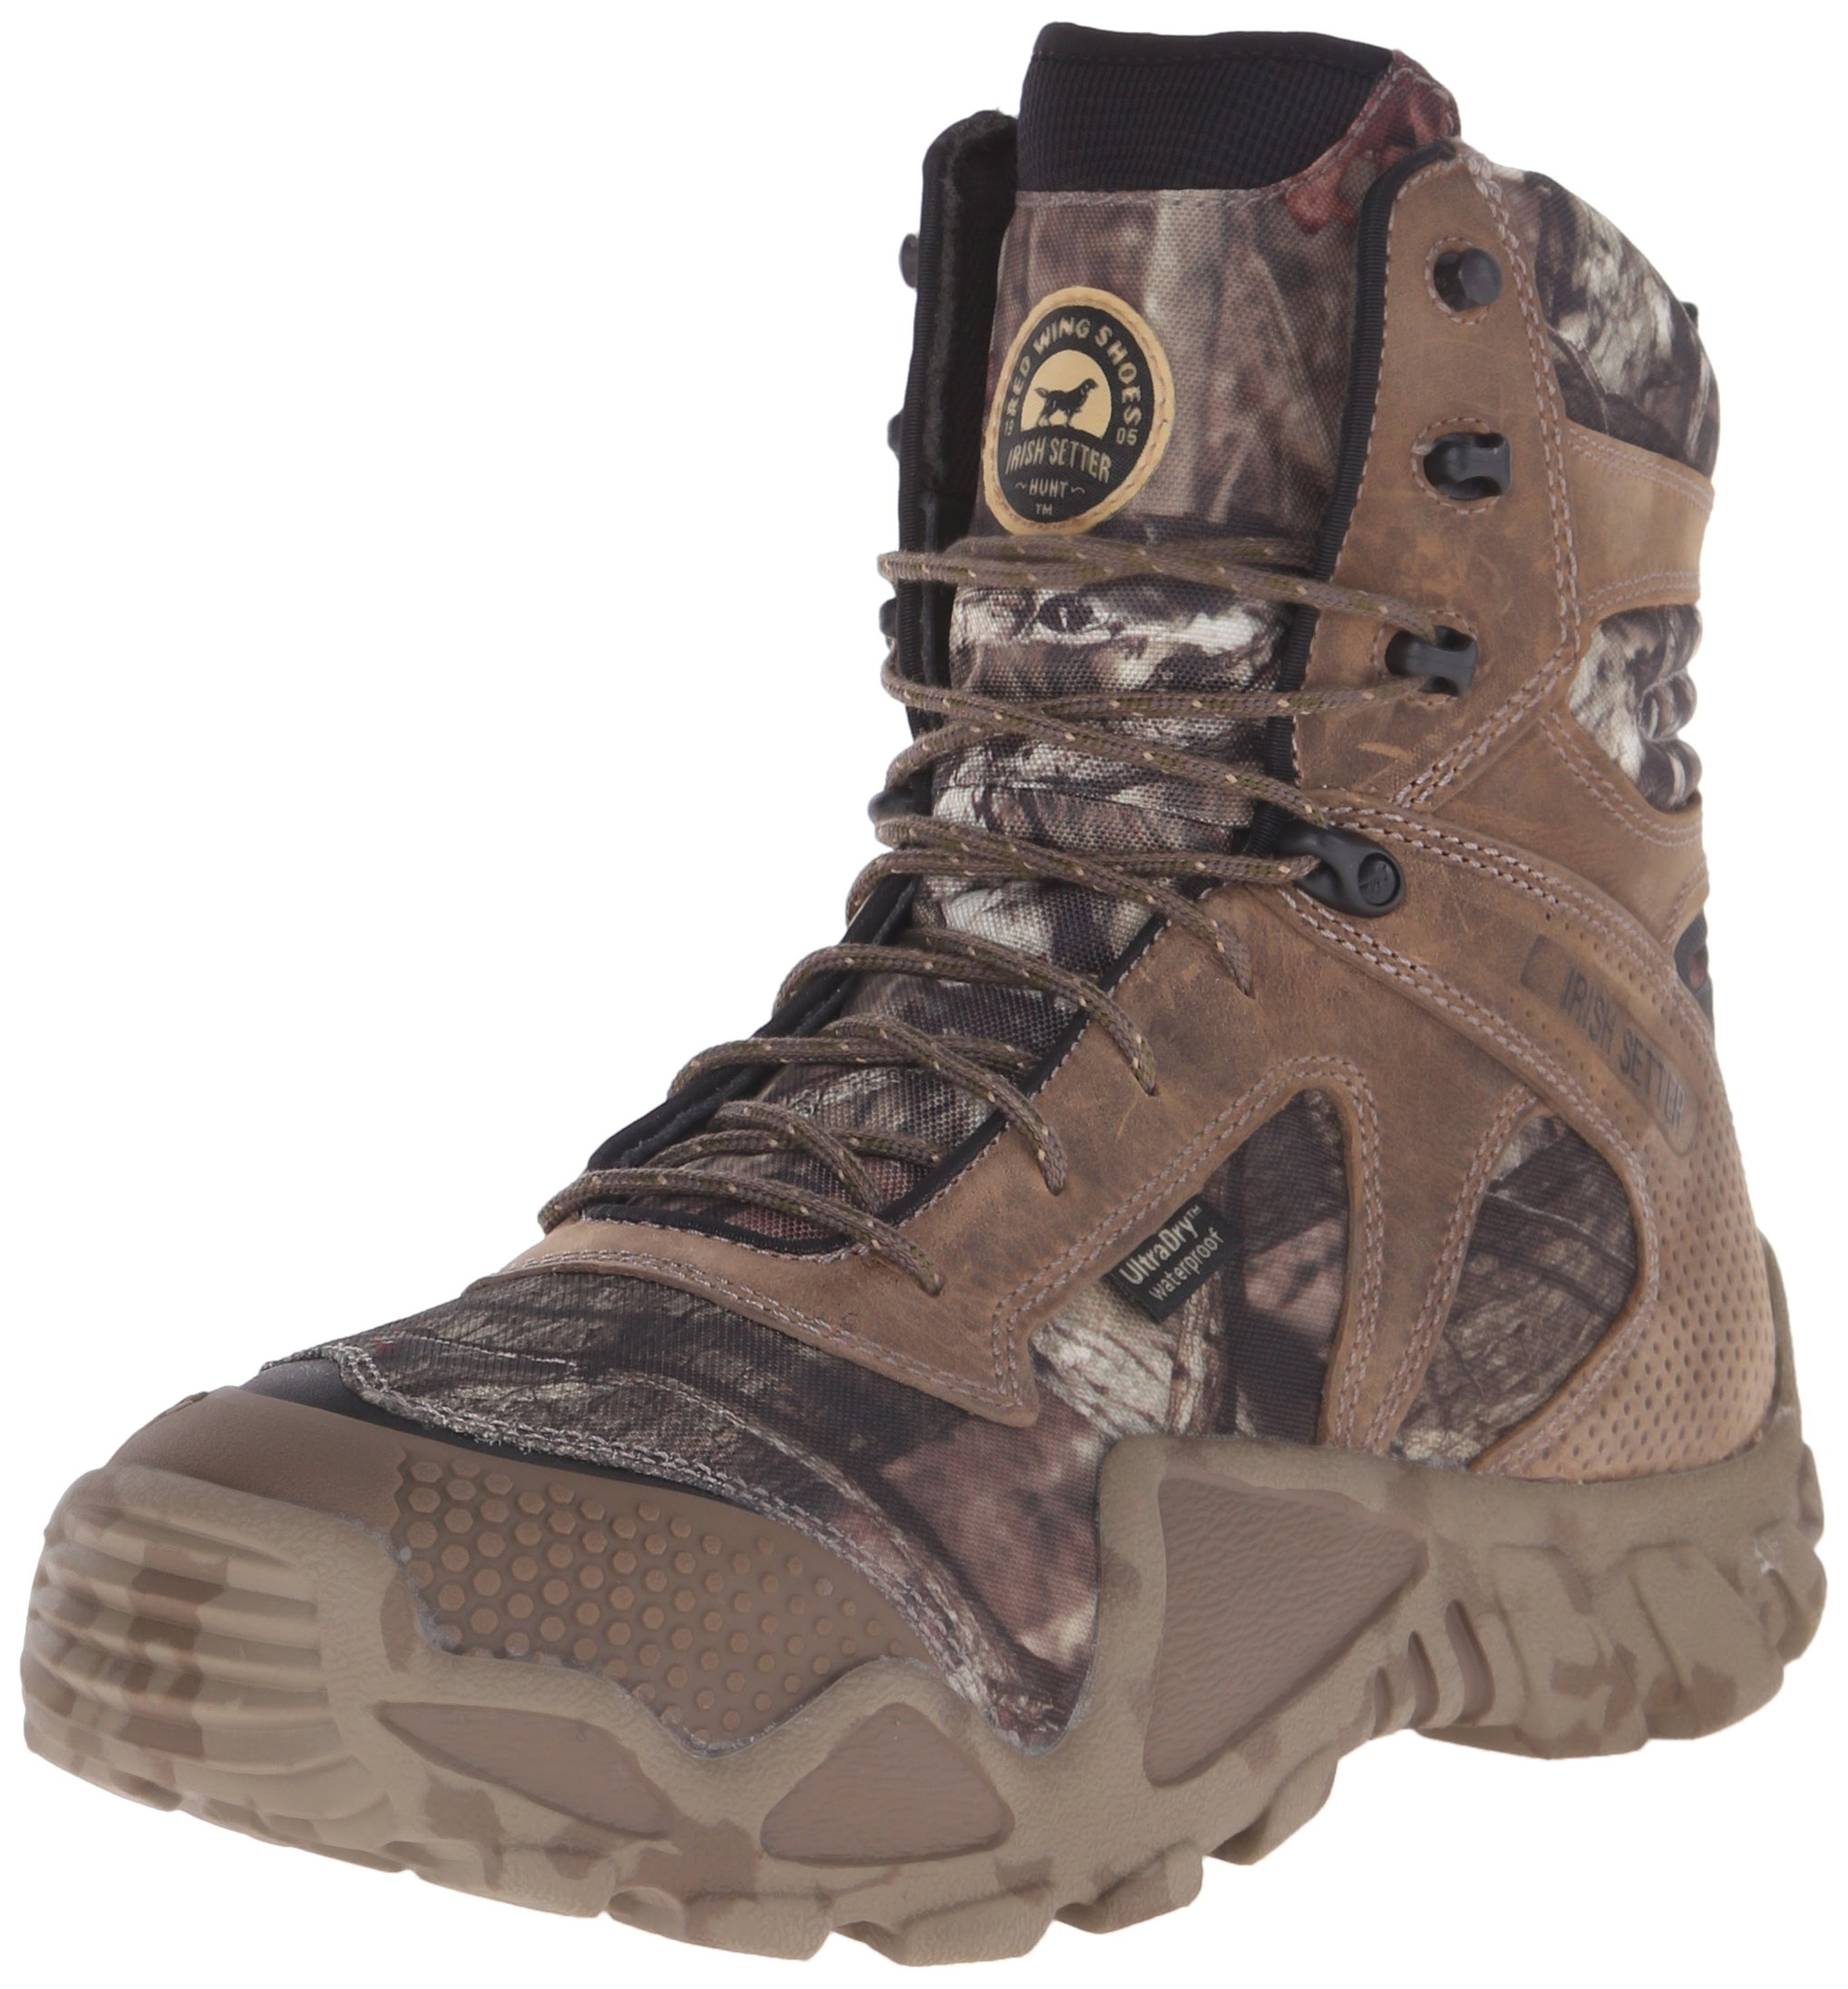 Irish Setter Men's 2868 Vaprtrek Waterproof 8'' Hunting Boot, Mossy Oak Break Up Infinity Camouflage,9.5 EE US by Irish Setter (Image #1)